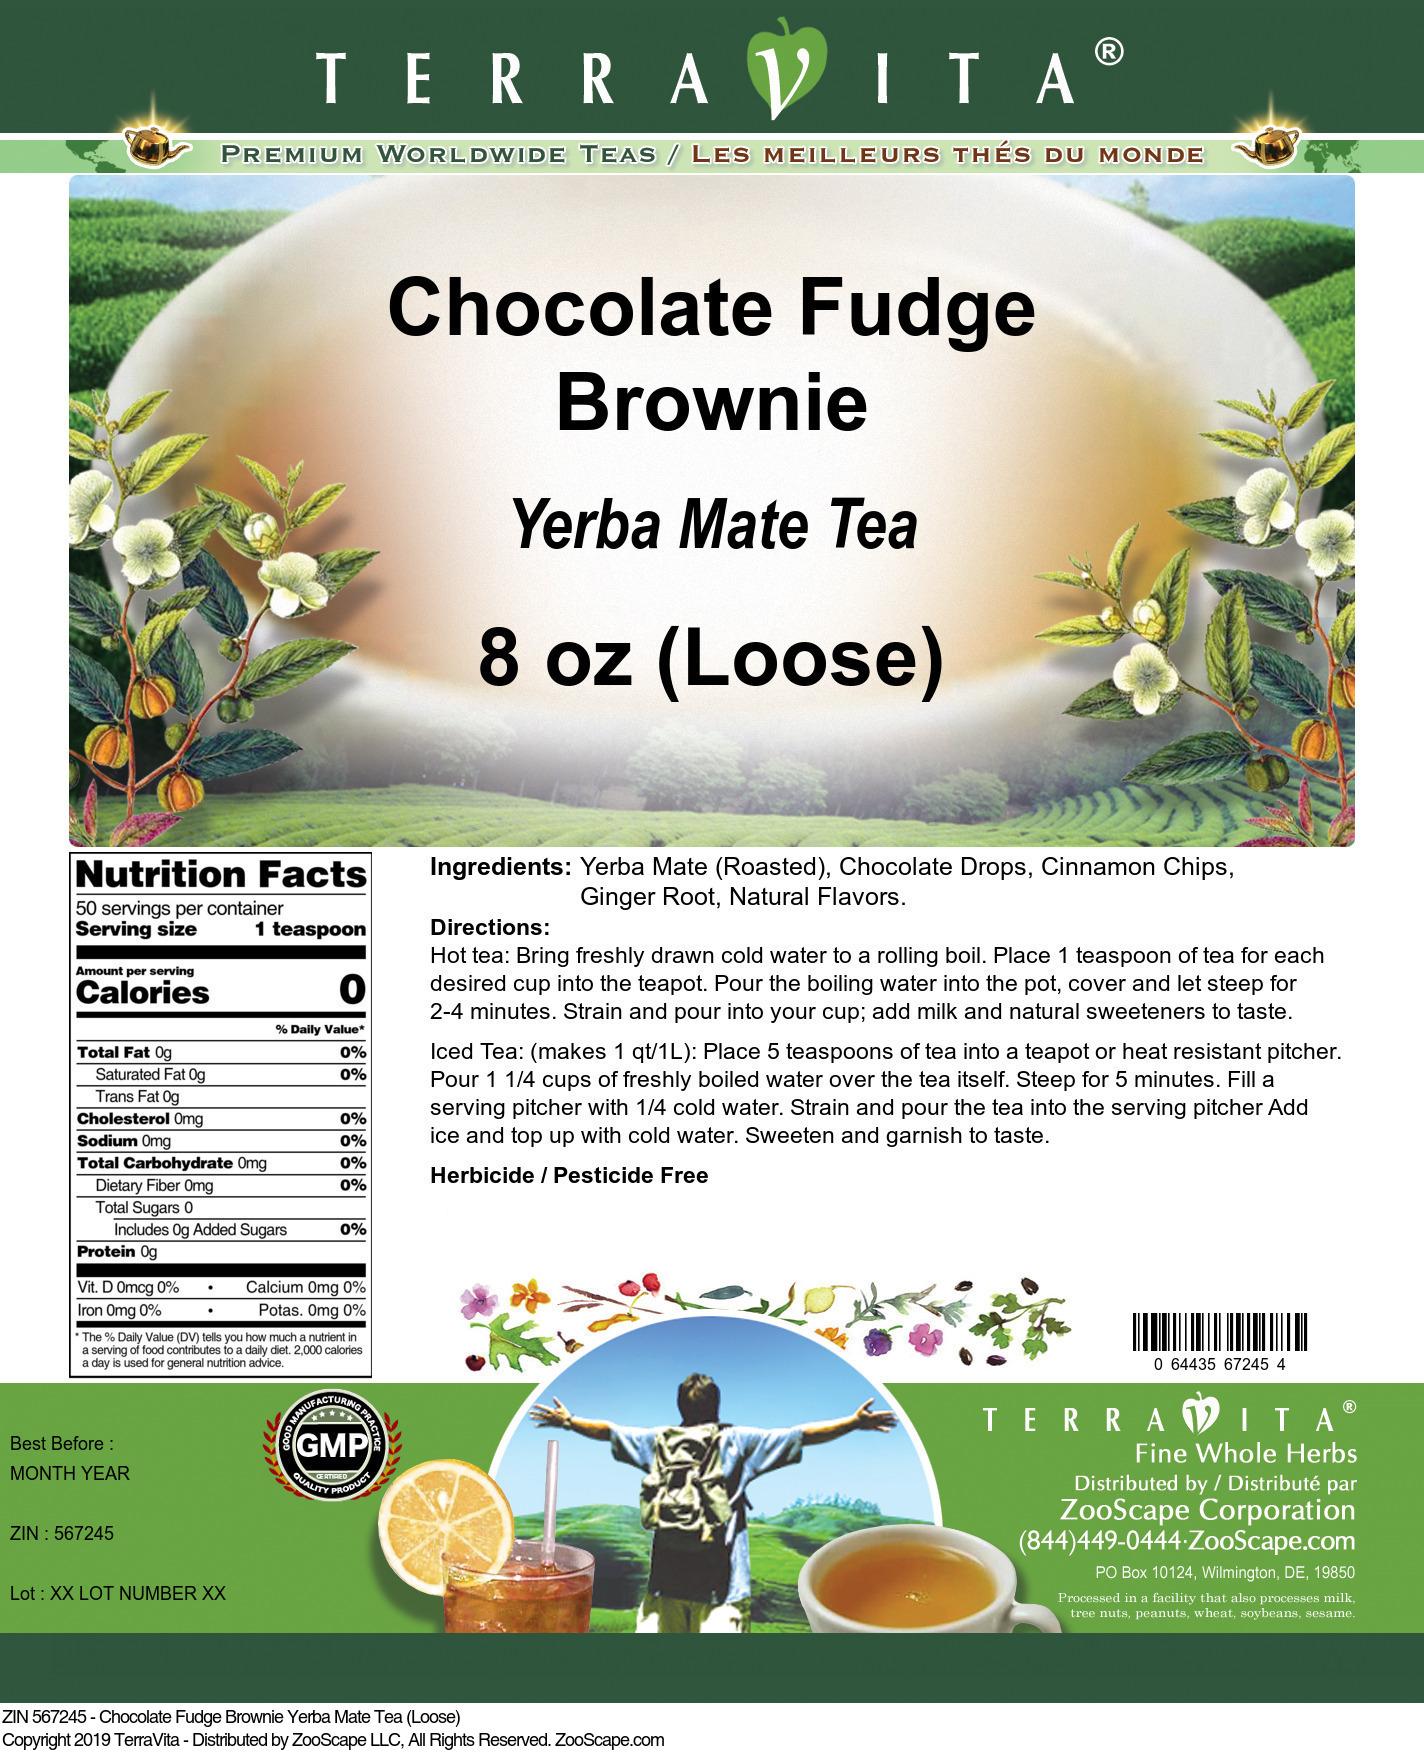 Chocolate Fudge Brownie Yerba Mate